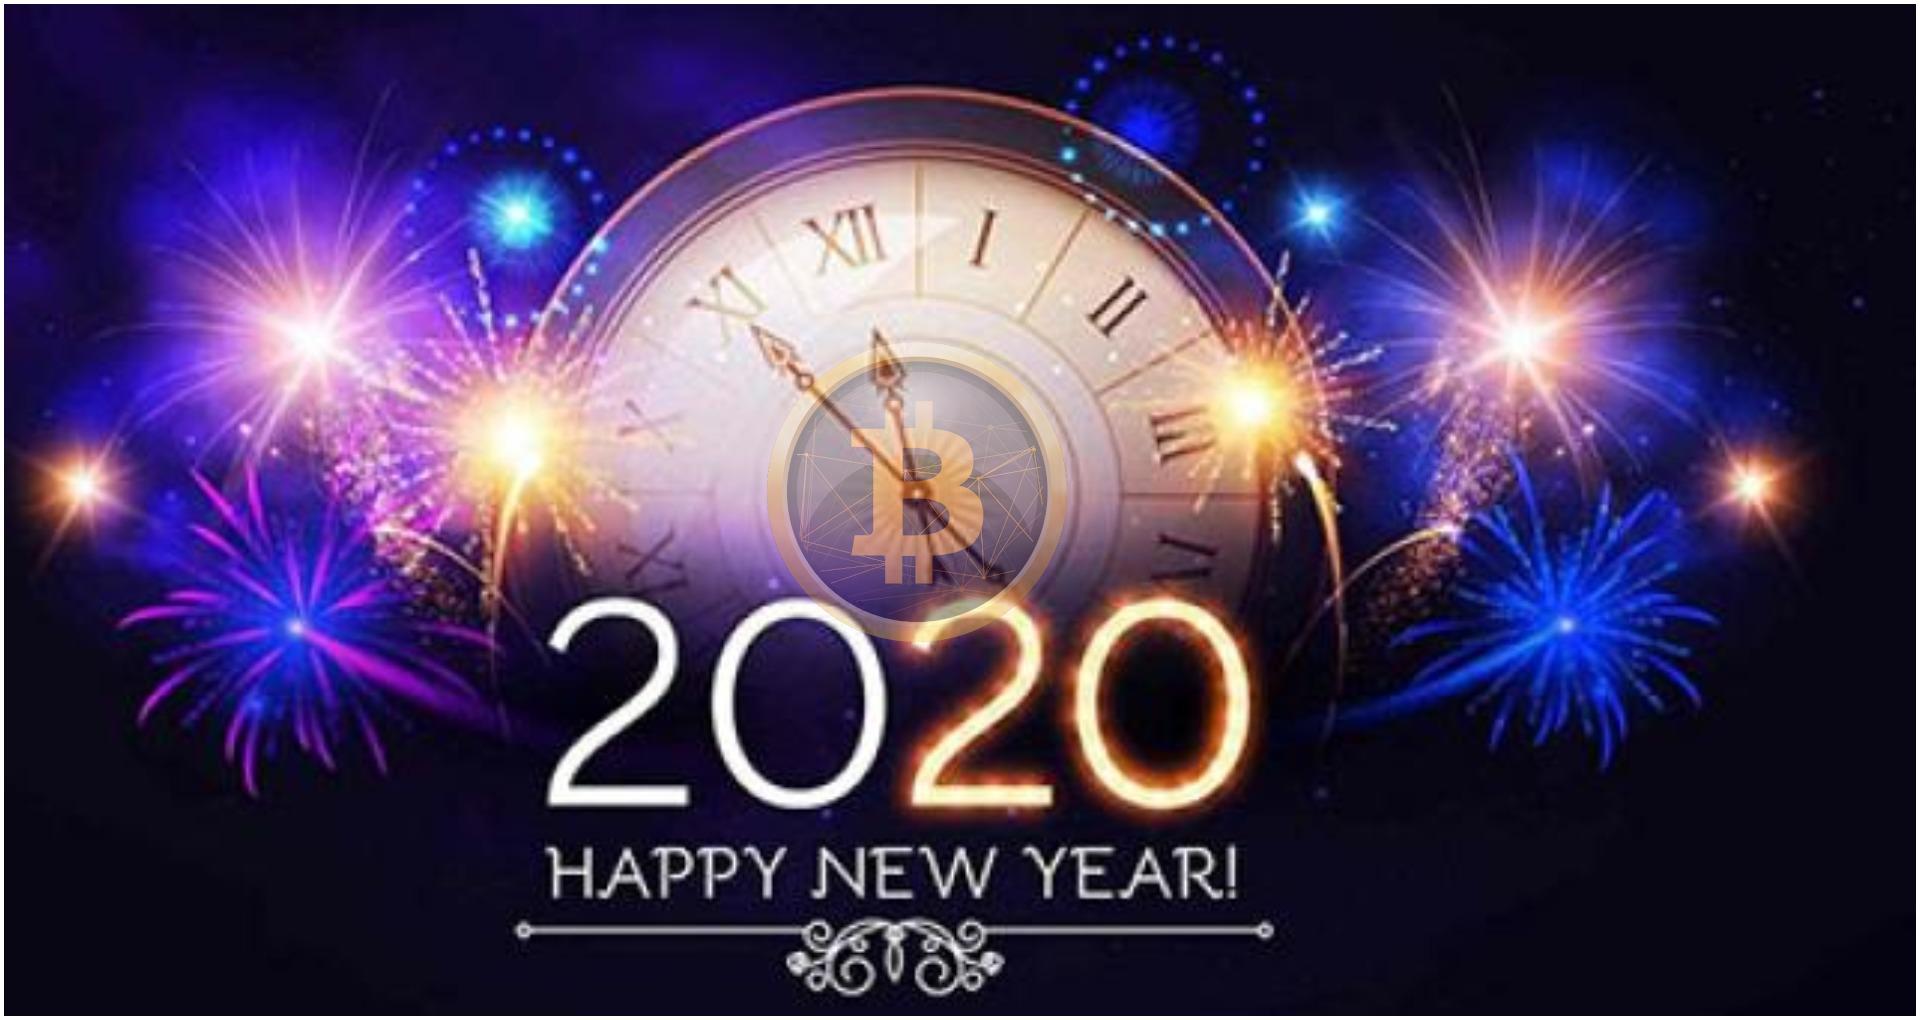 bitcoin 2020 btc